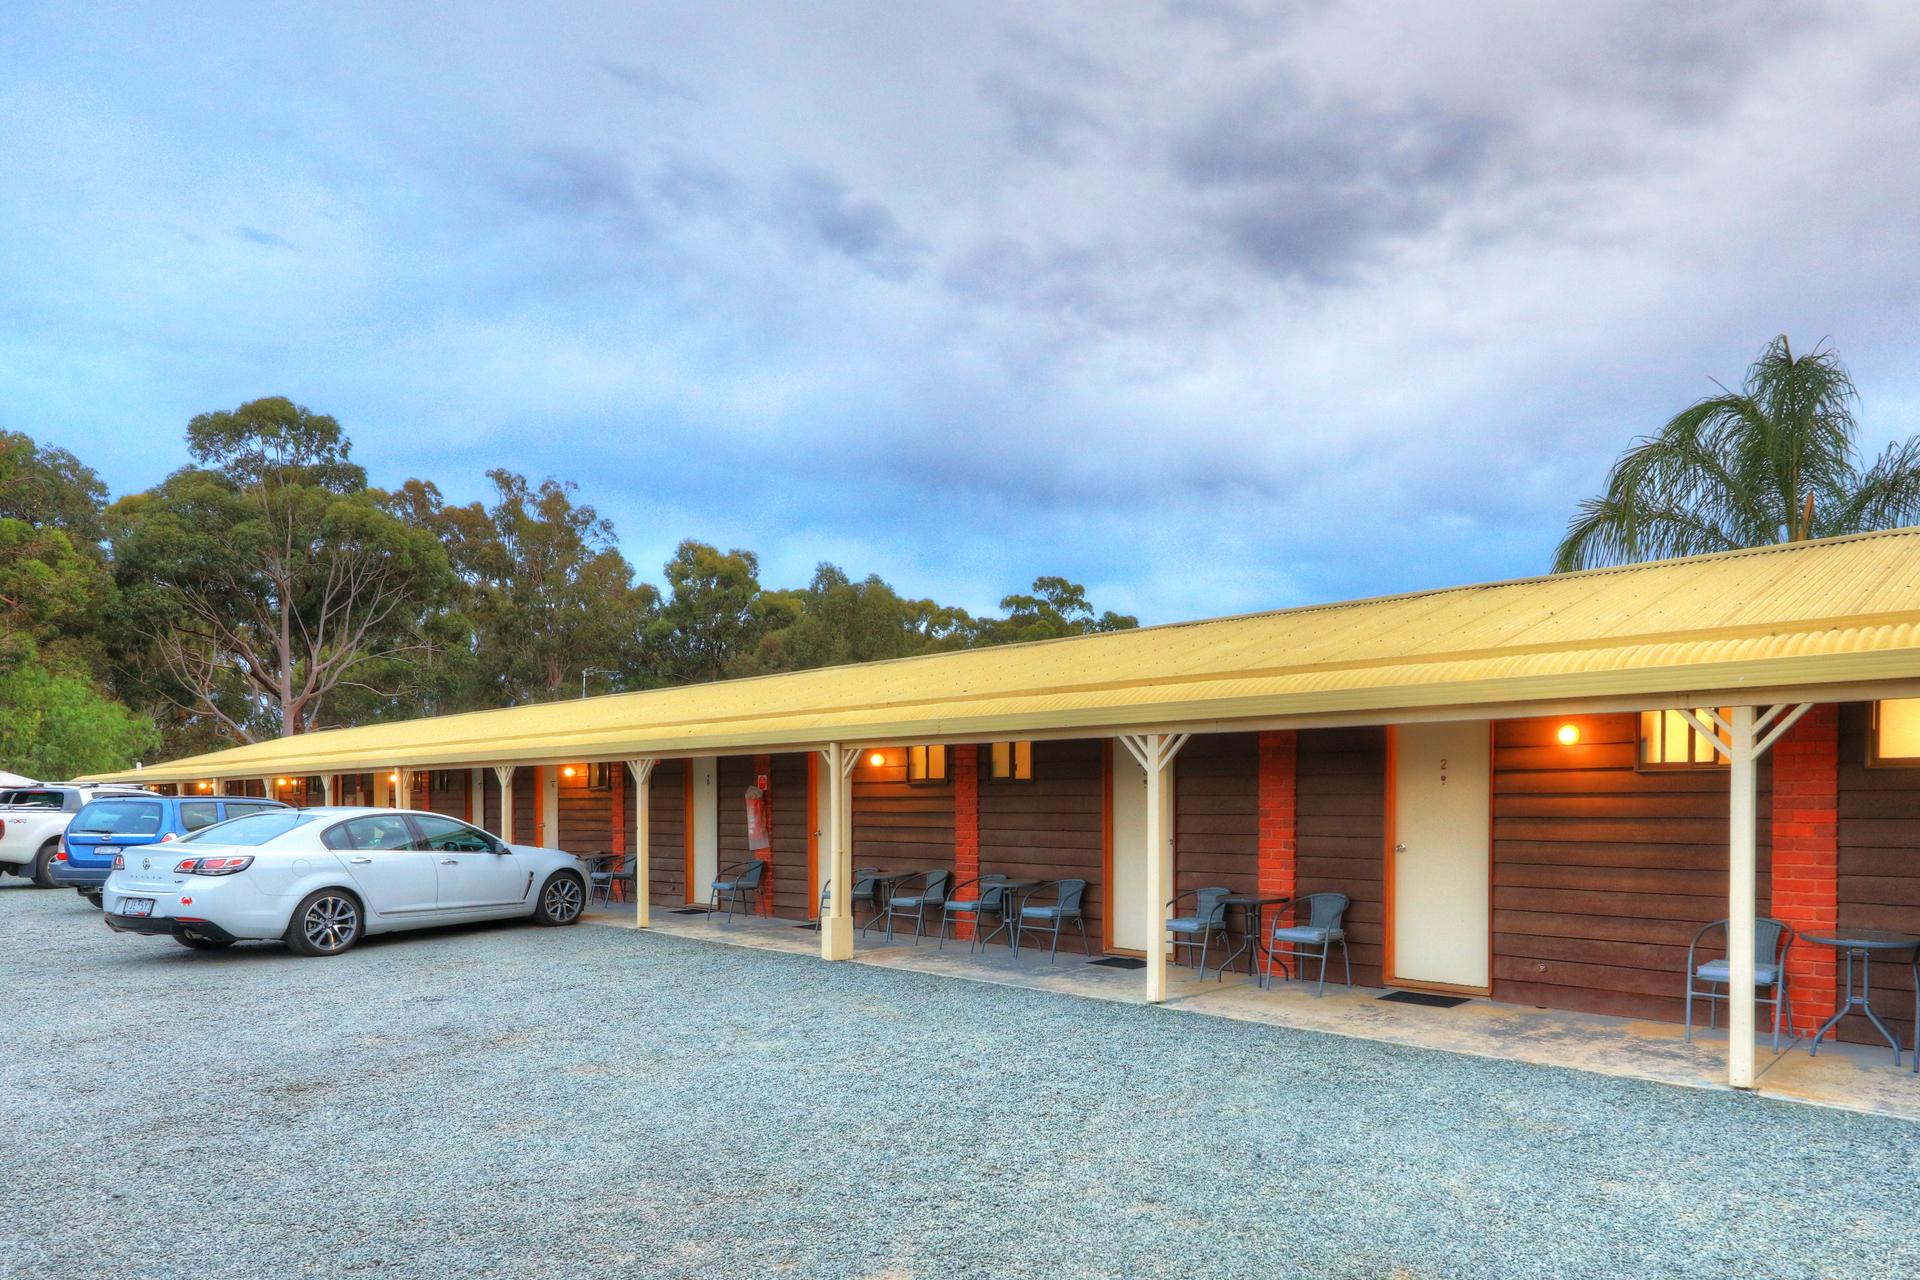 f - Kyabram Country Motel